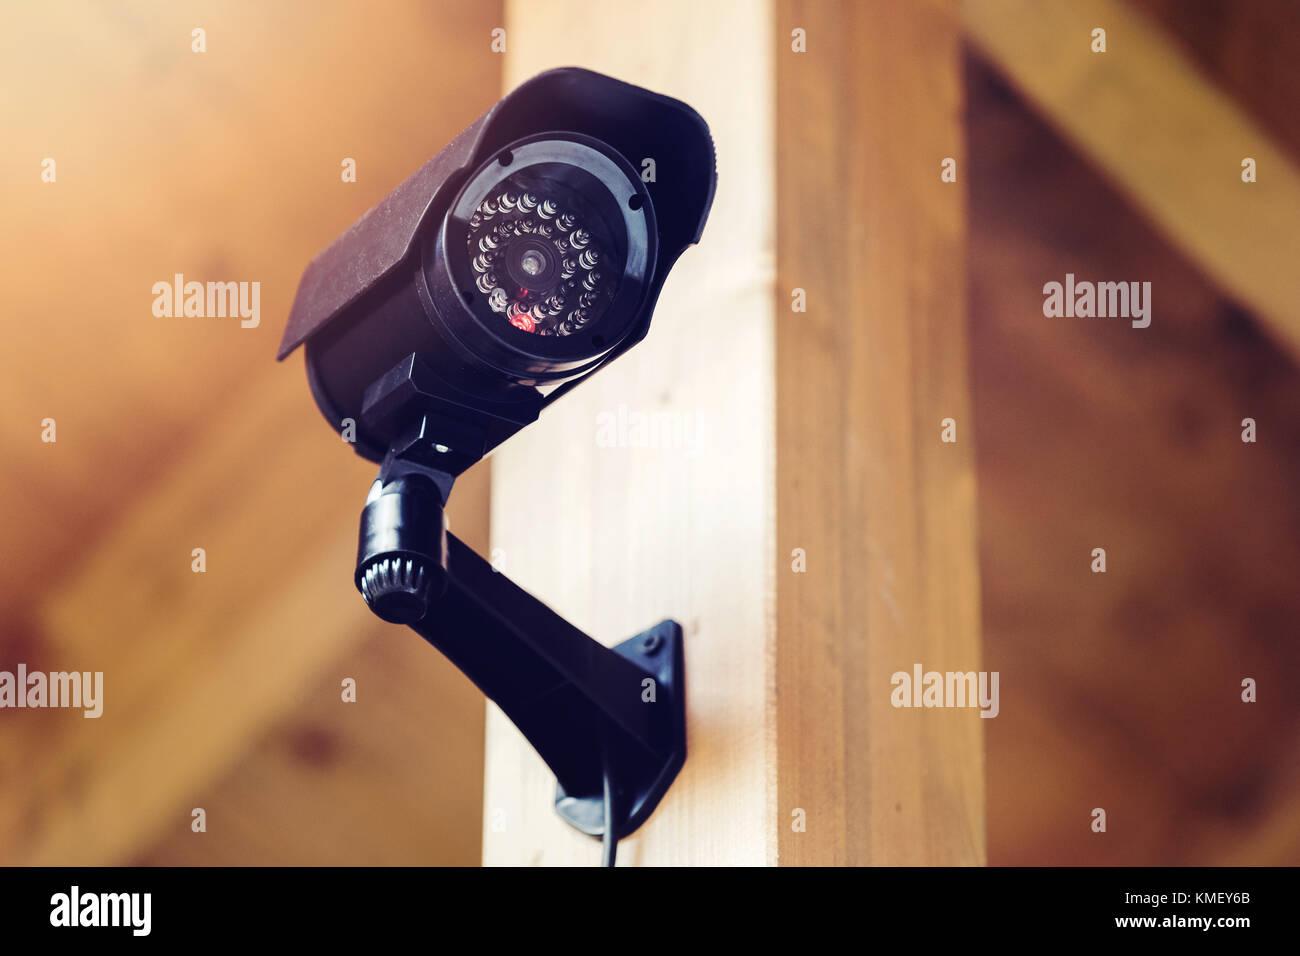 black security surveillance camera - Stock Image